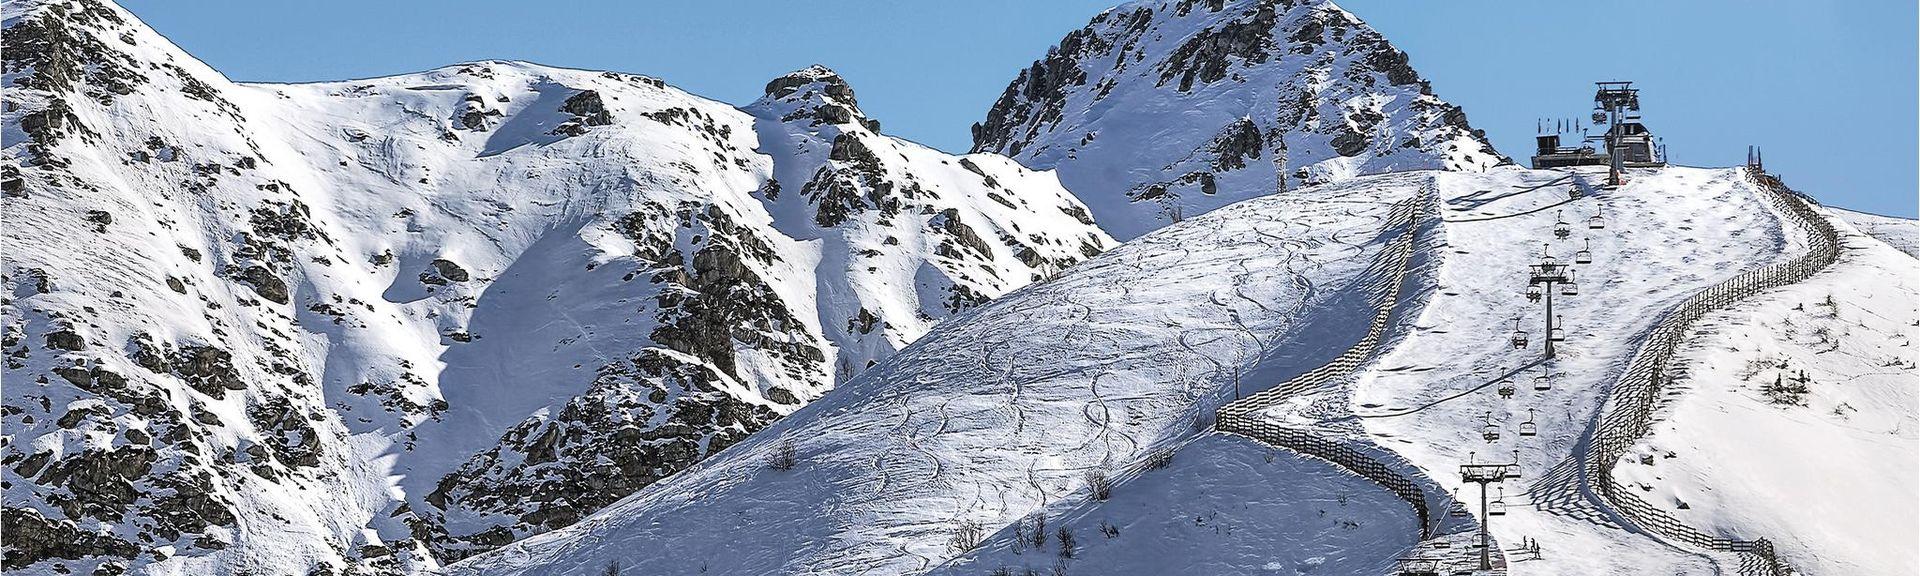 Crissolo - Skigebiet Monviso, Crissolo, Piedmont, Italien